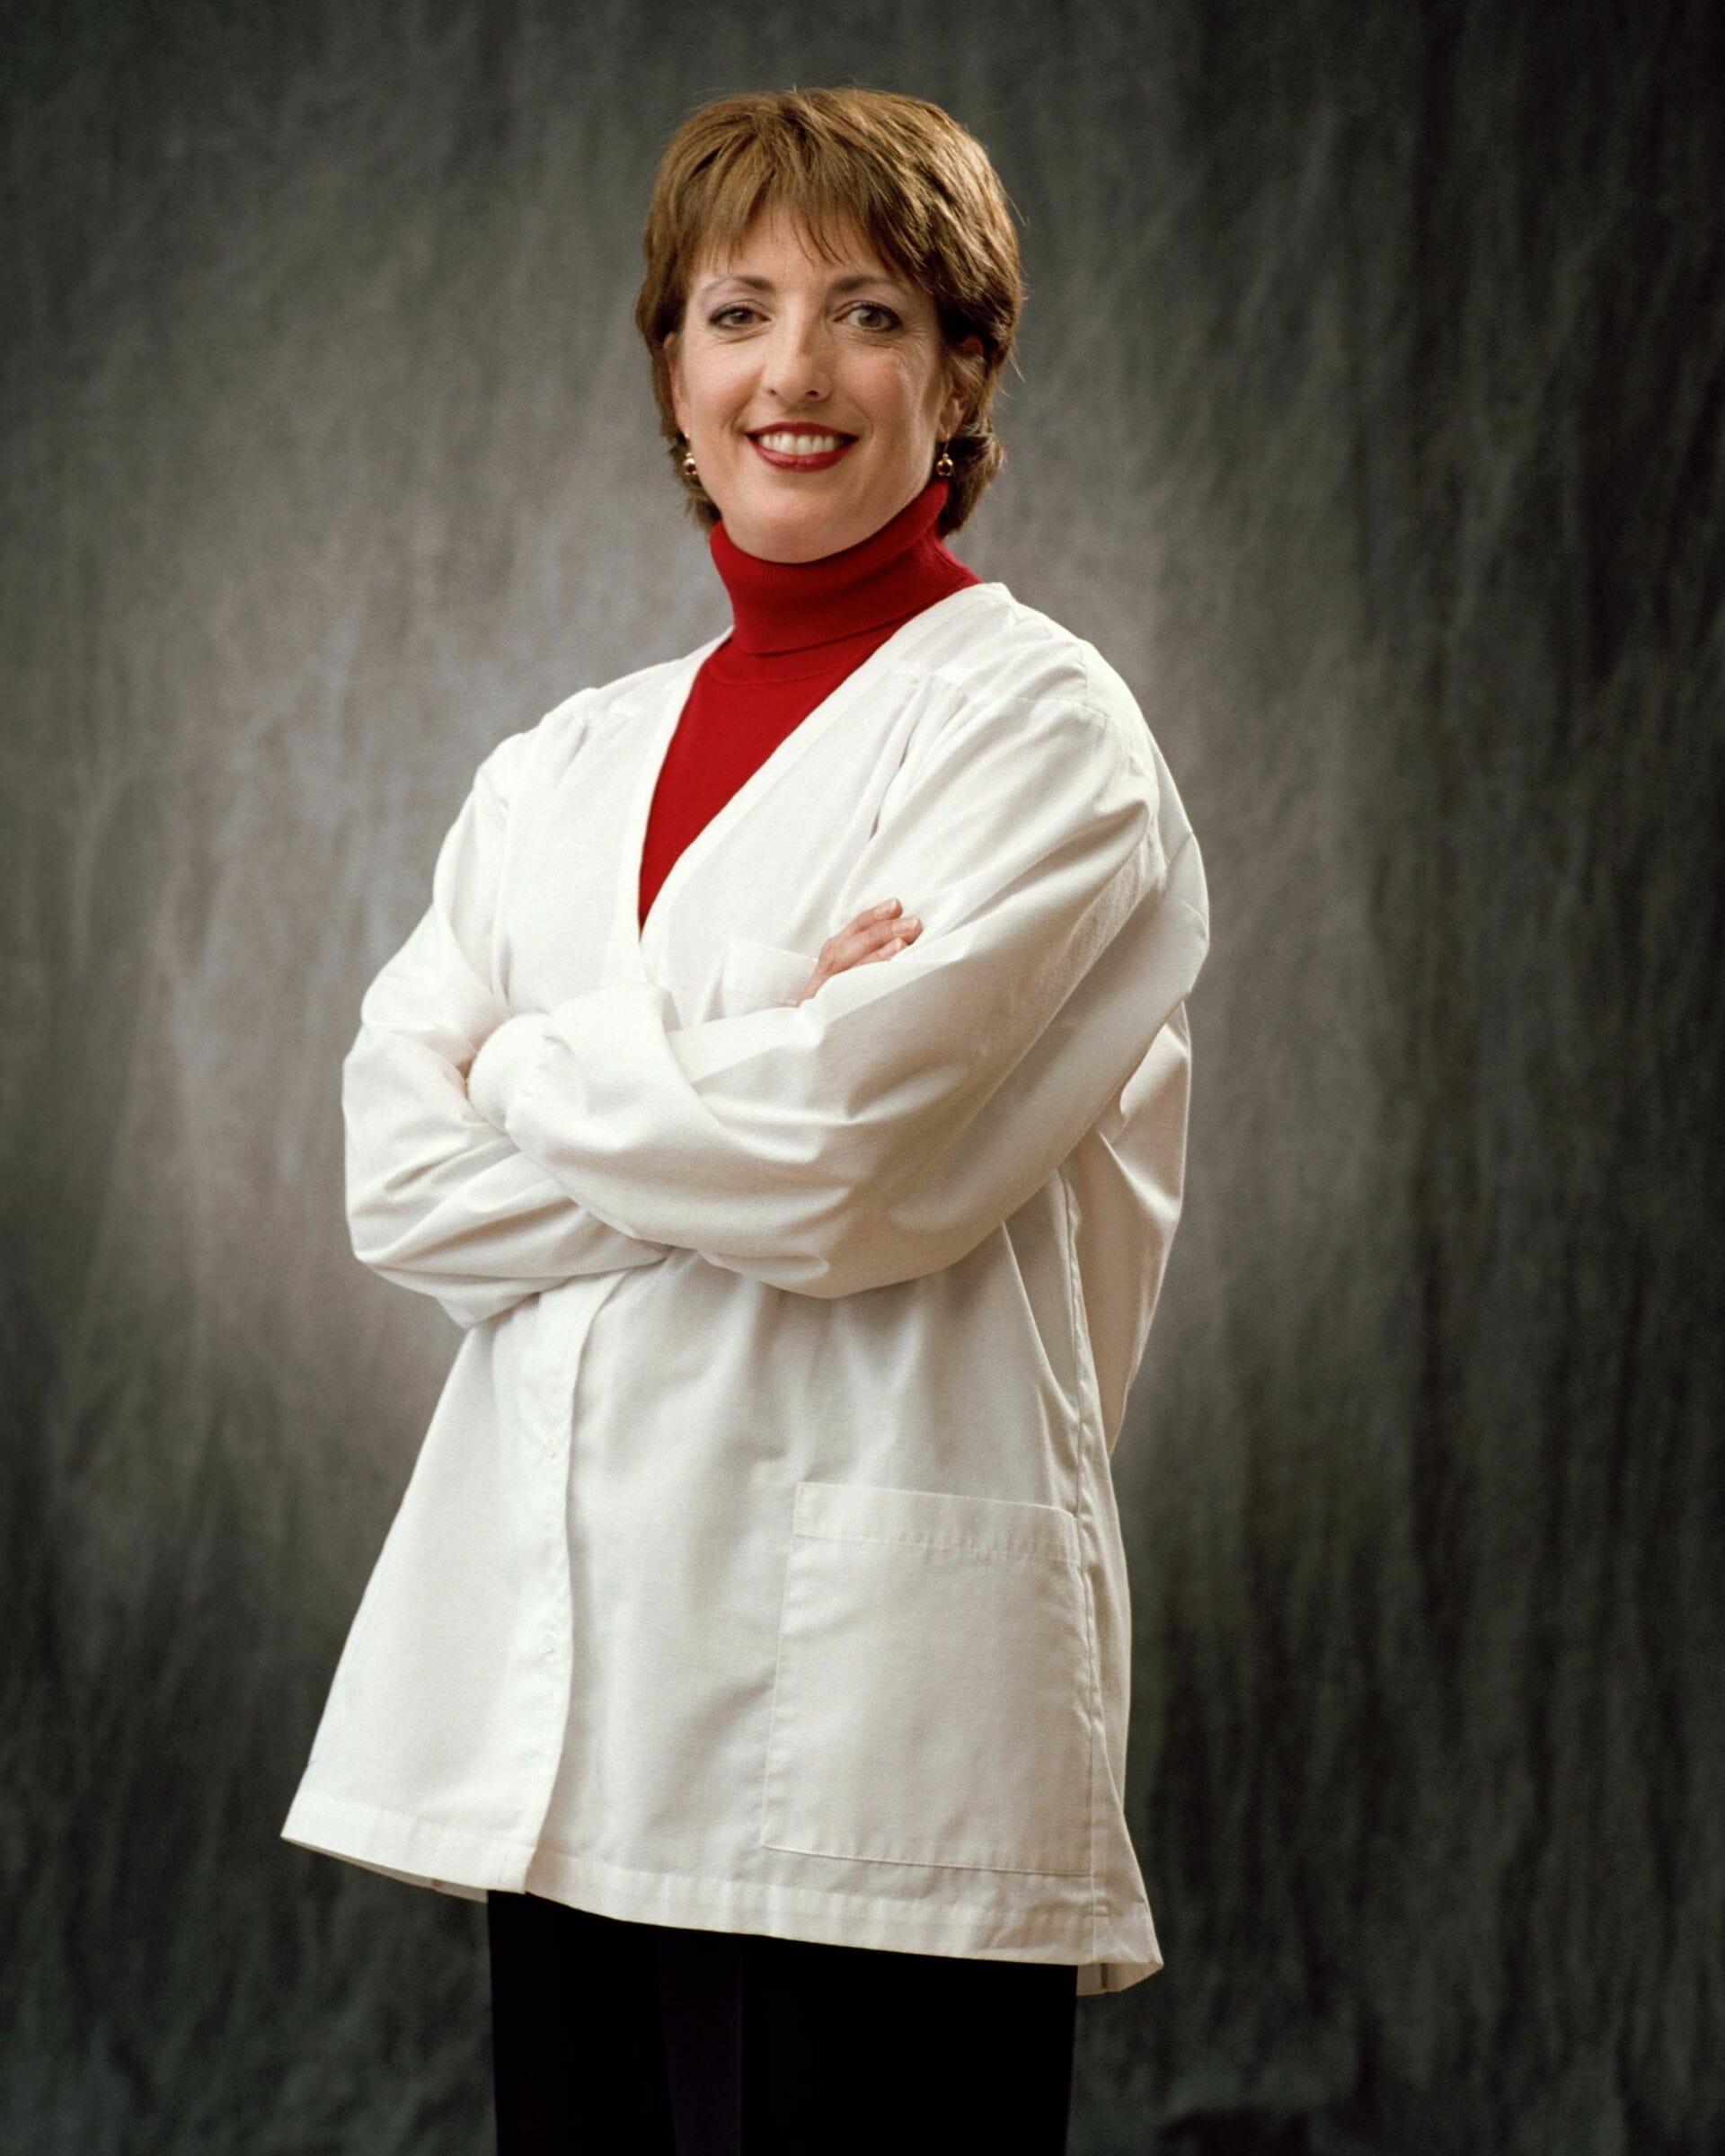 Dr. Jeanne Nicolette